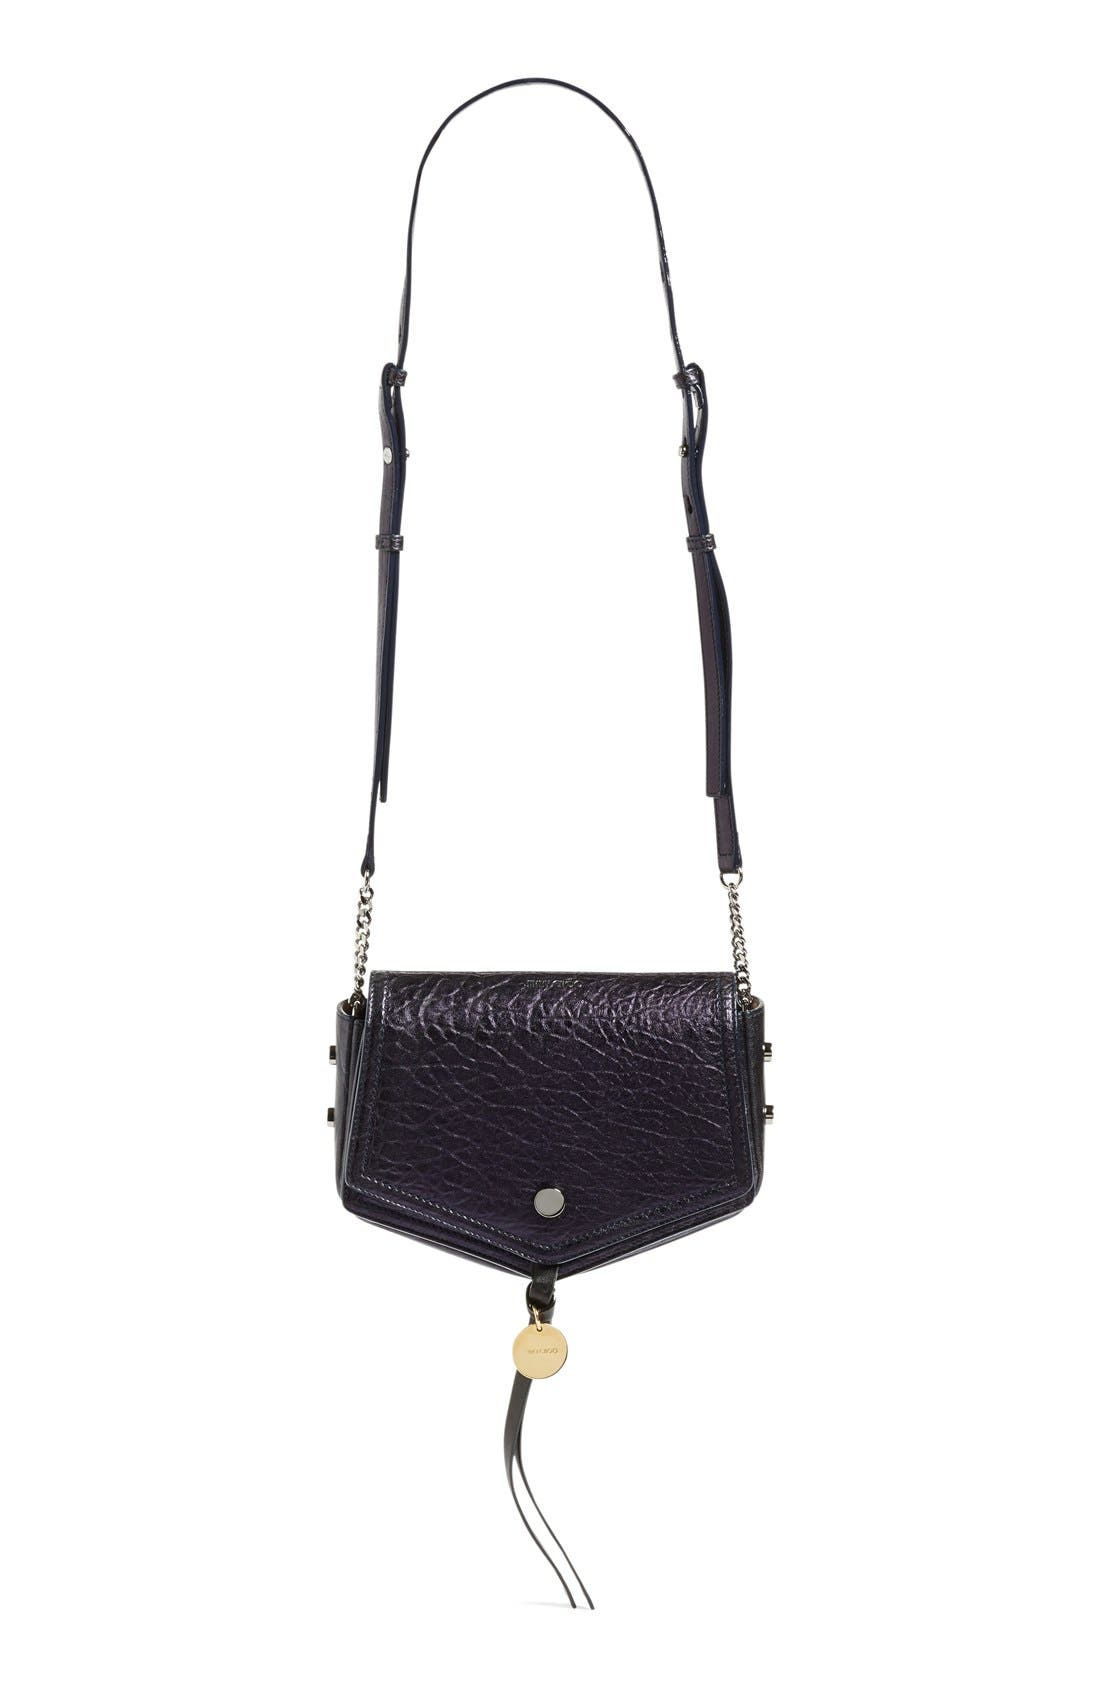 JIMMY CHOO Arrow Metallic Grained Leather Shoulder Bag